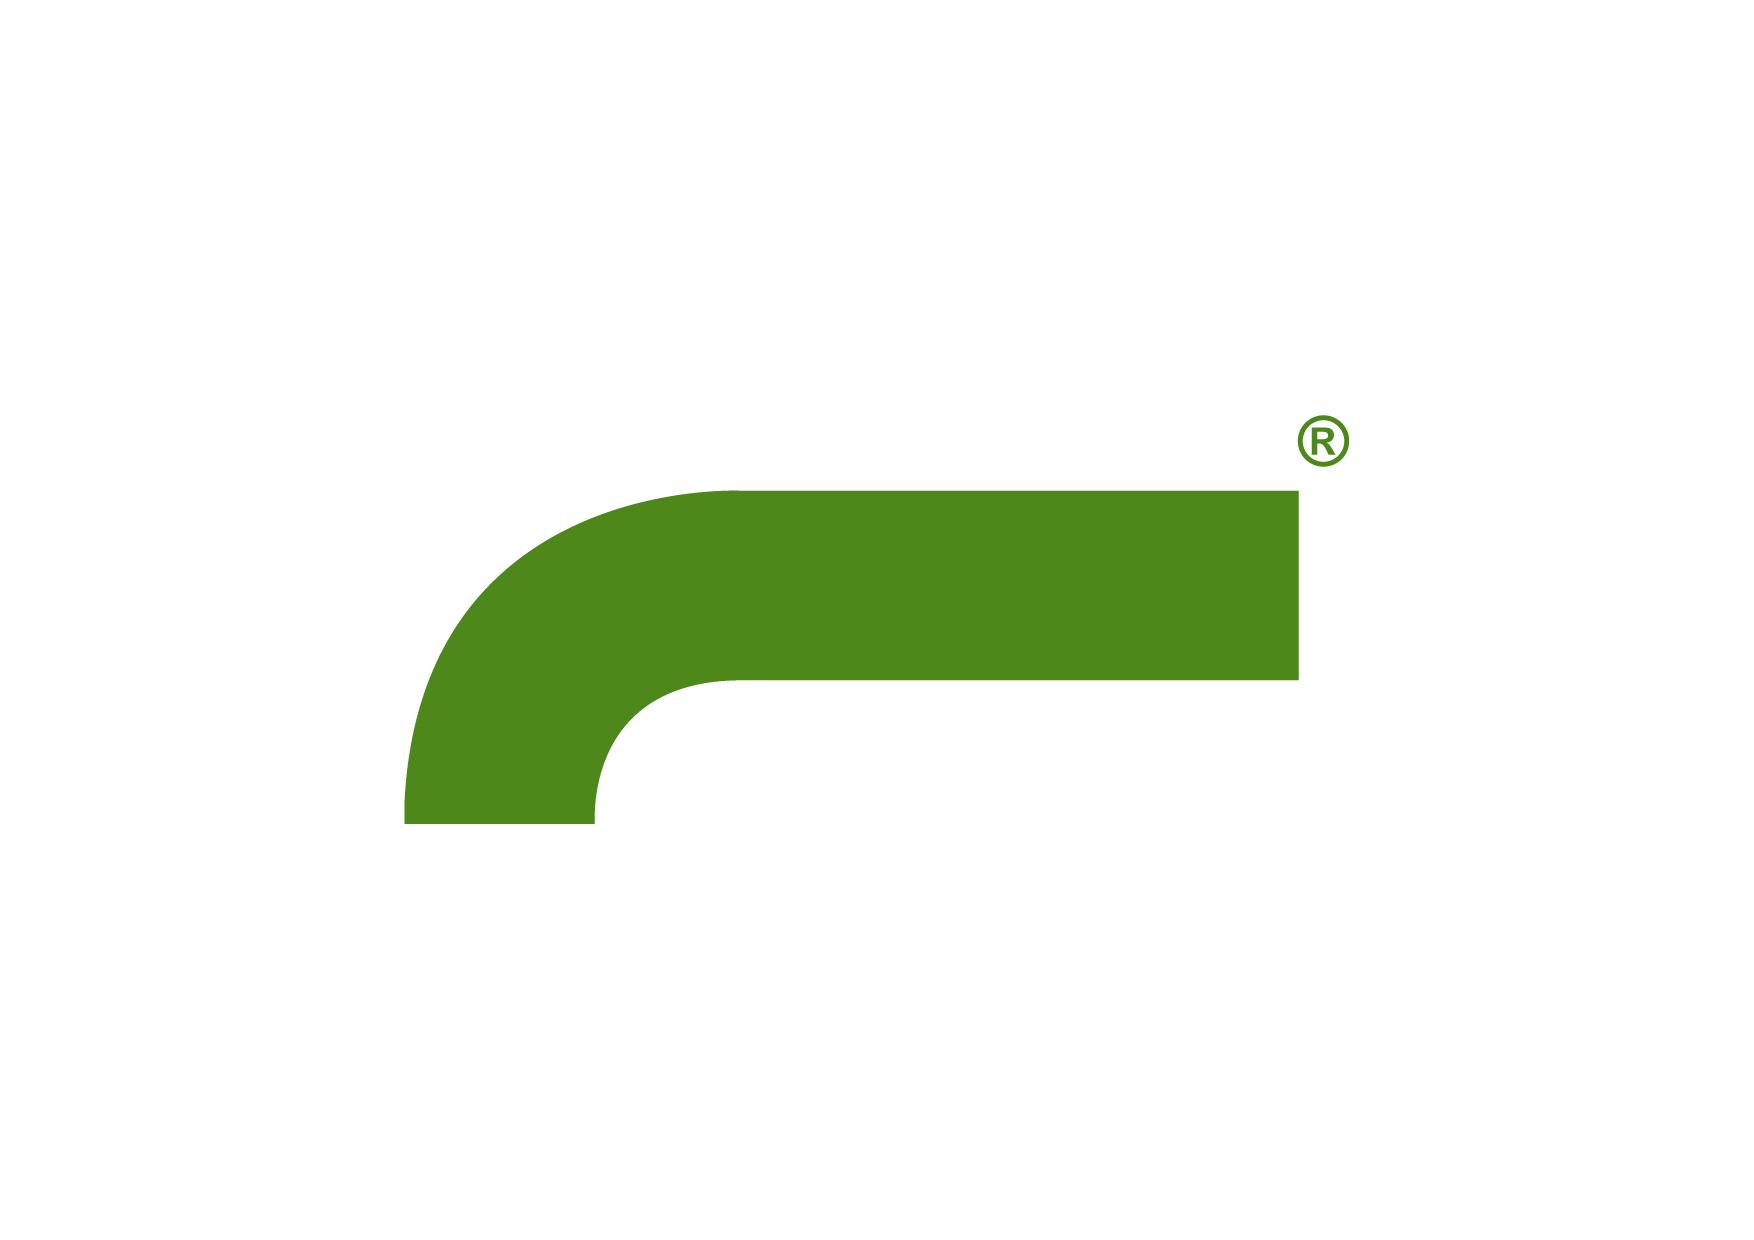 ECL logo design